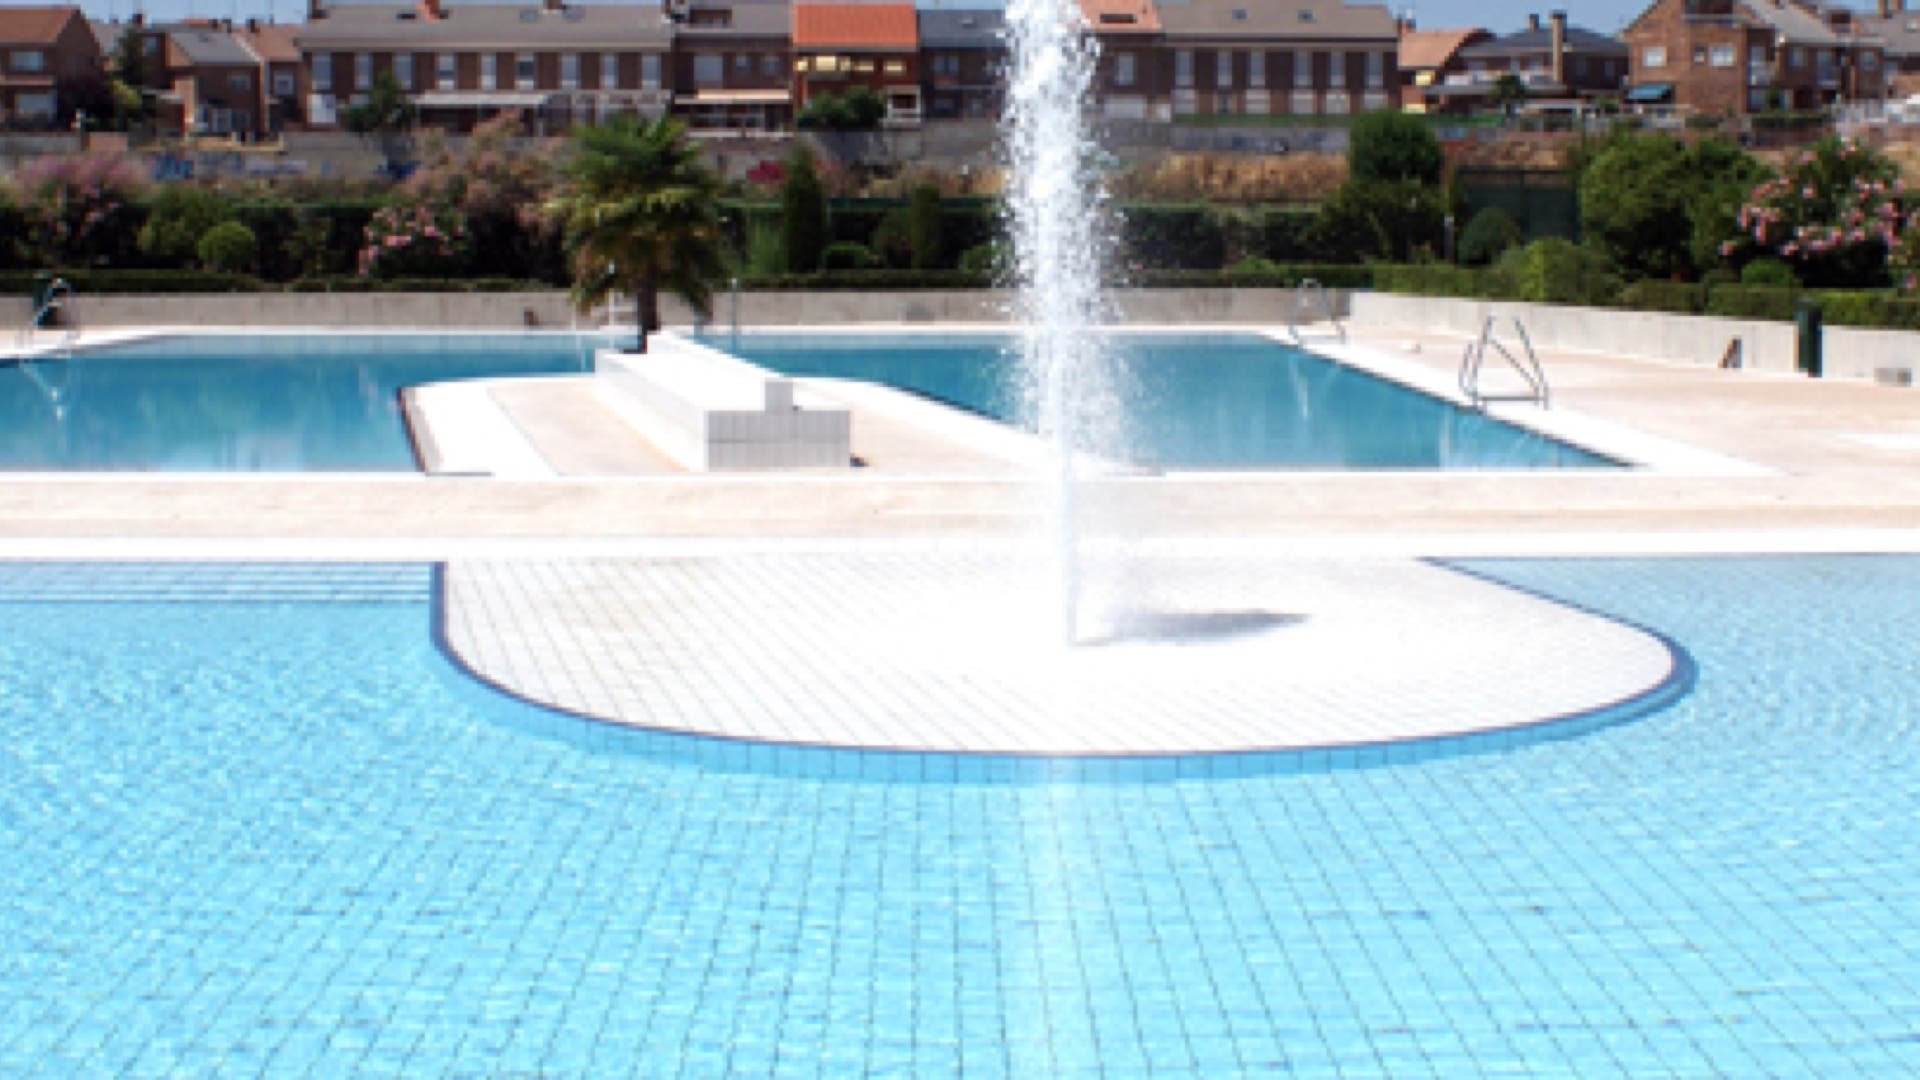 Liner armado piscinas precio pvc liquido ak blanco botes for Precios piscinas